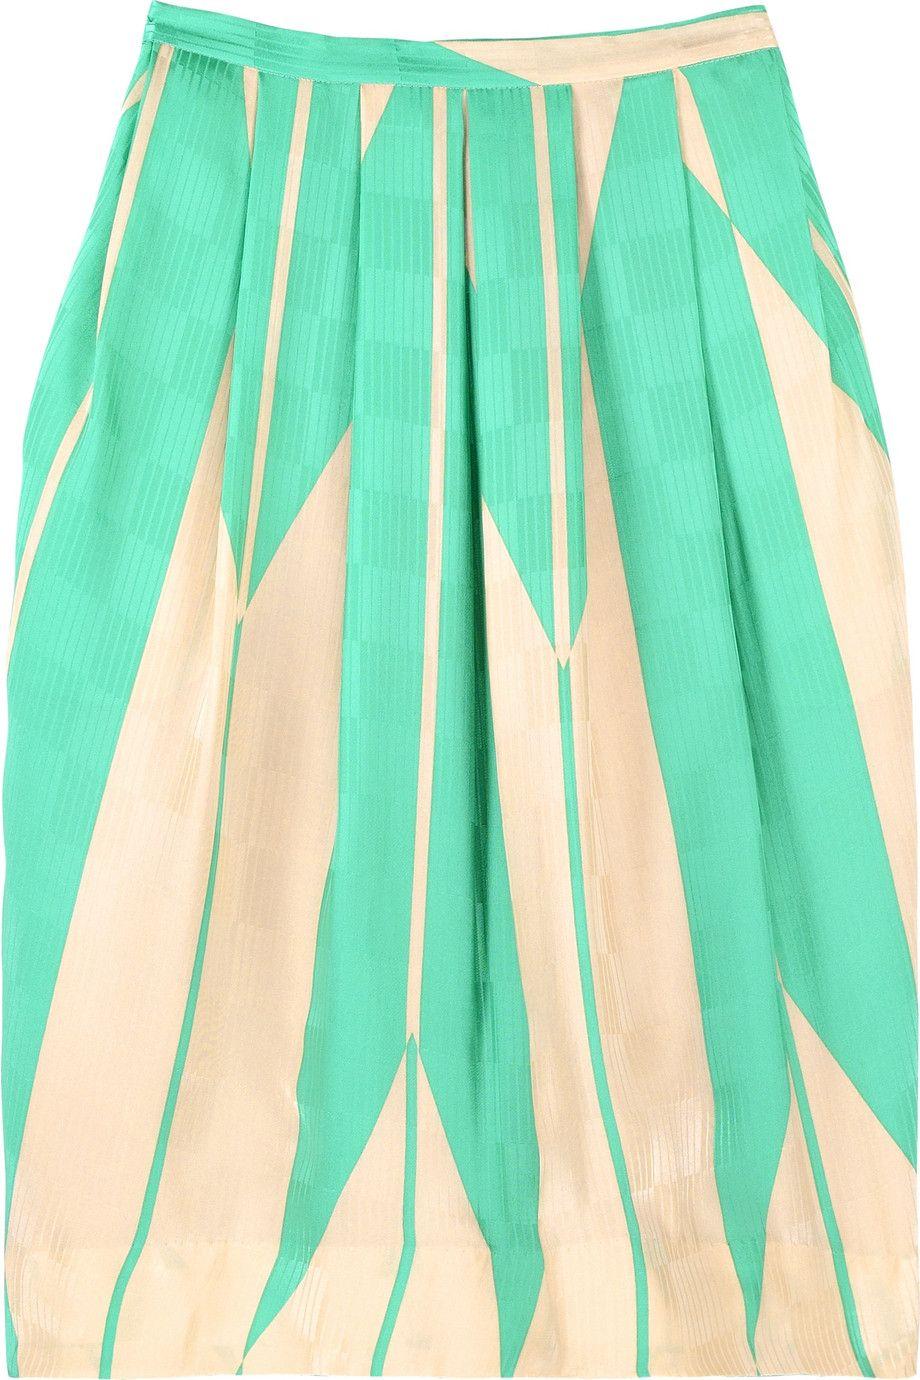 isalai printed silk skirt ++ malene birger